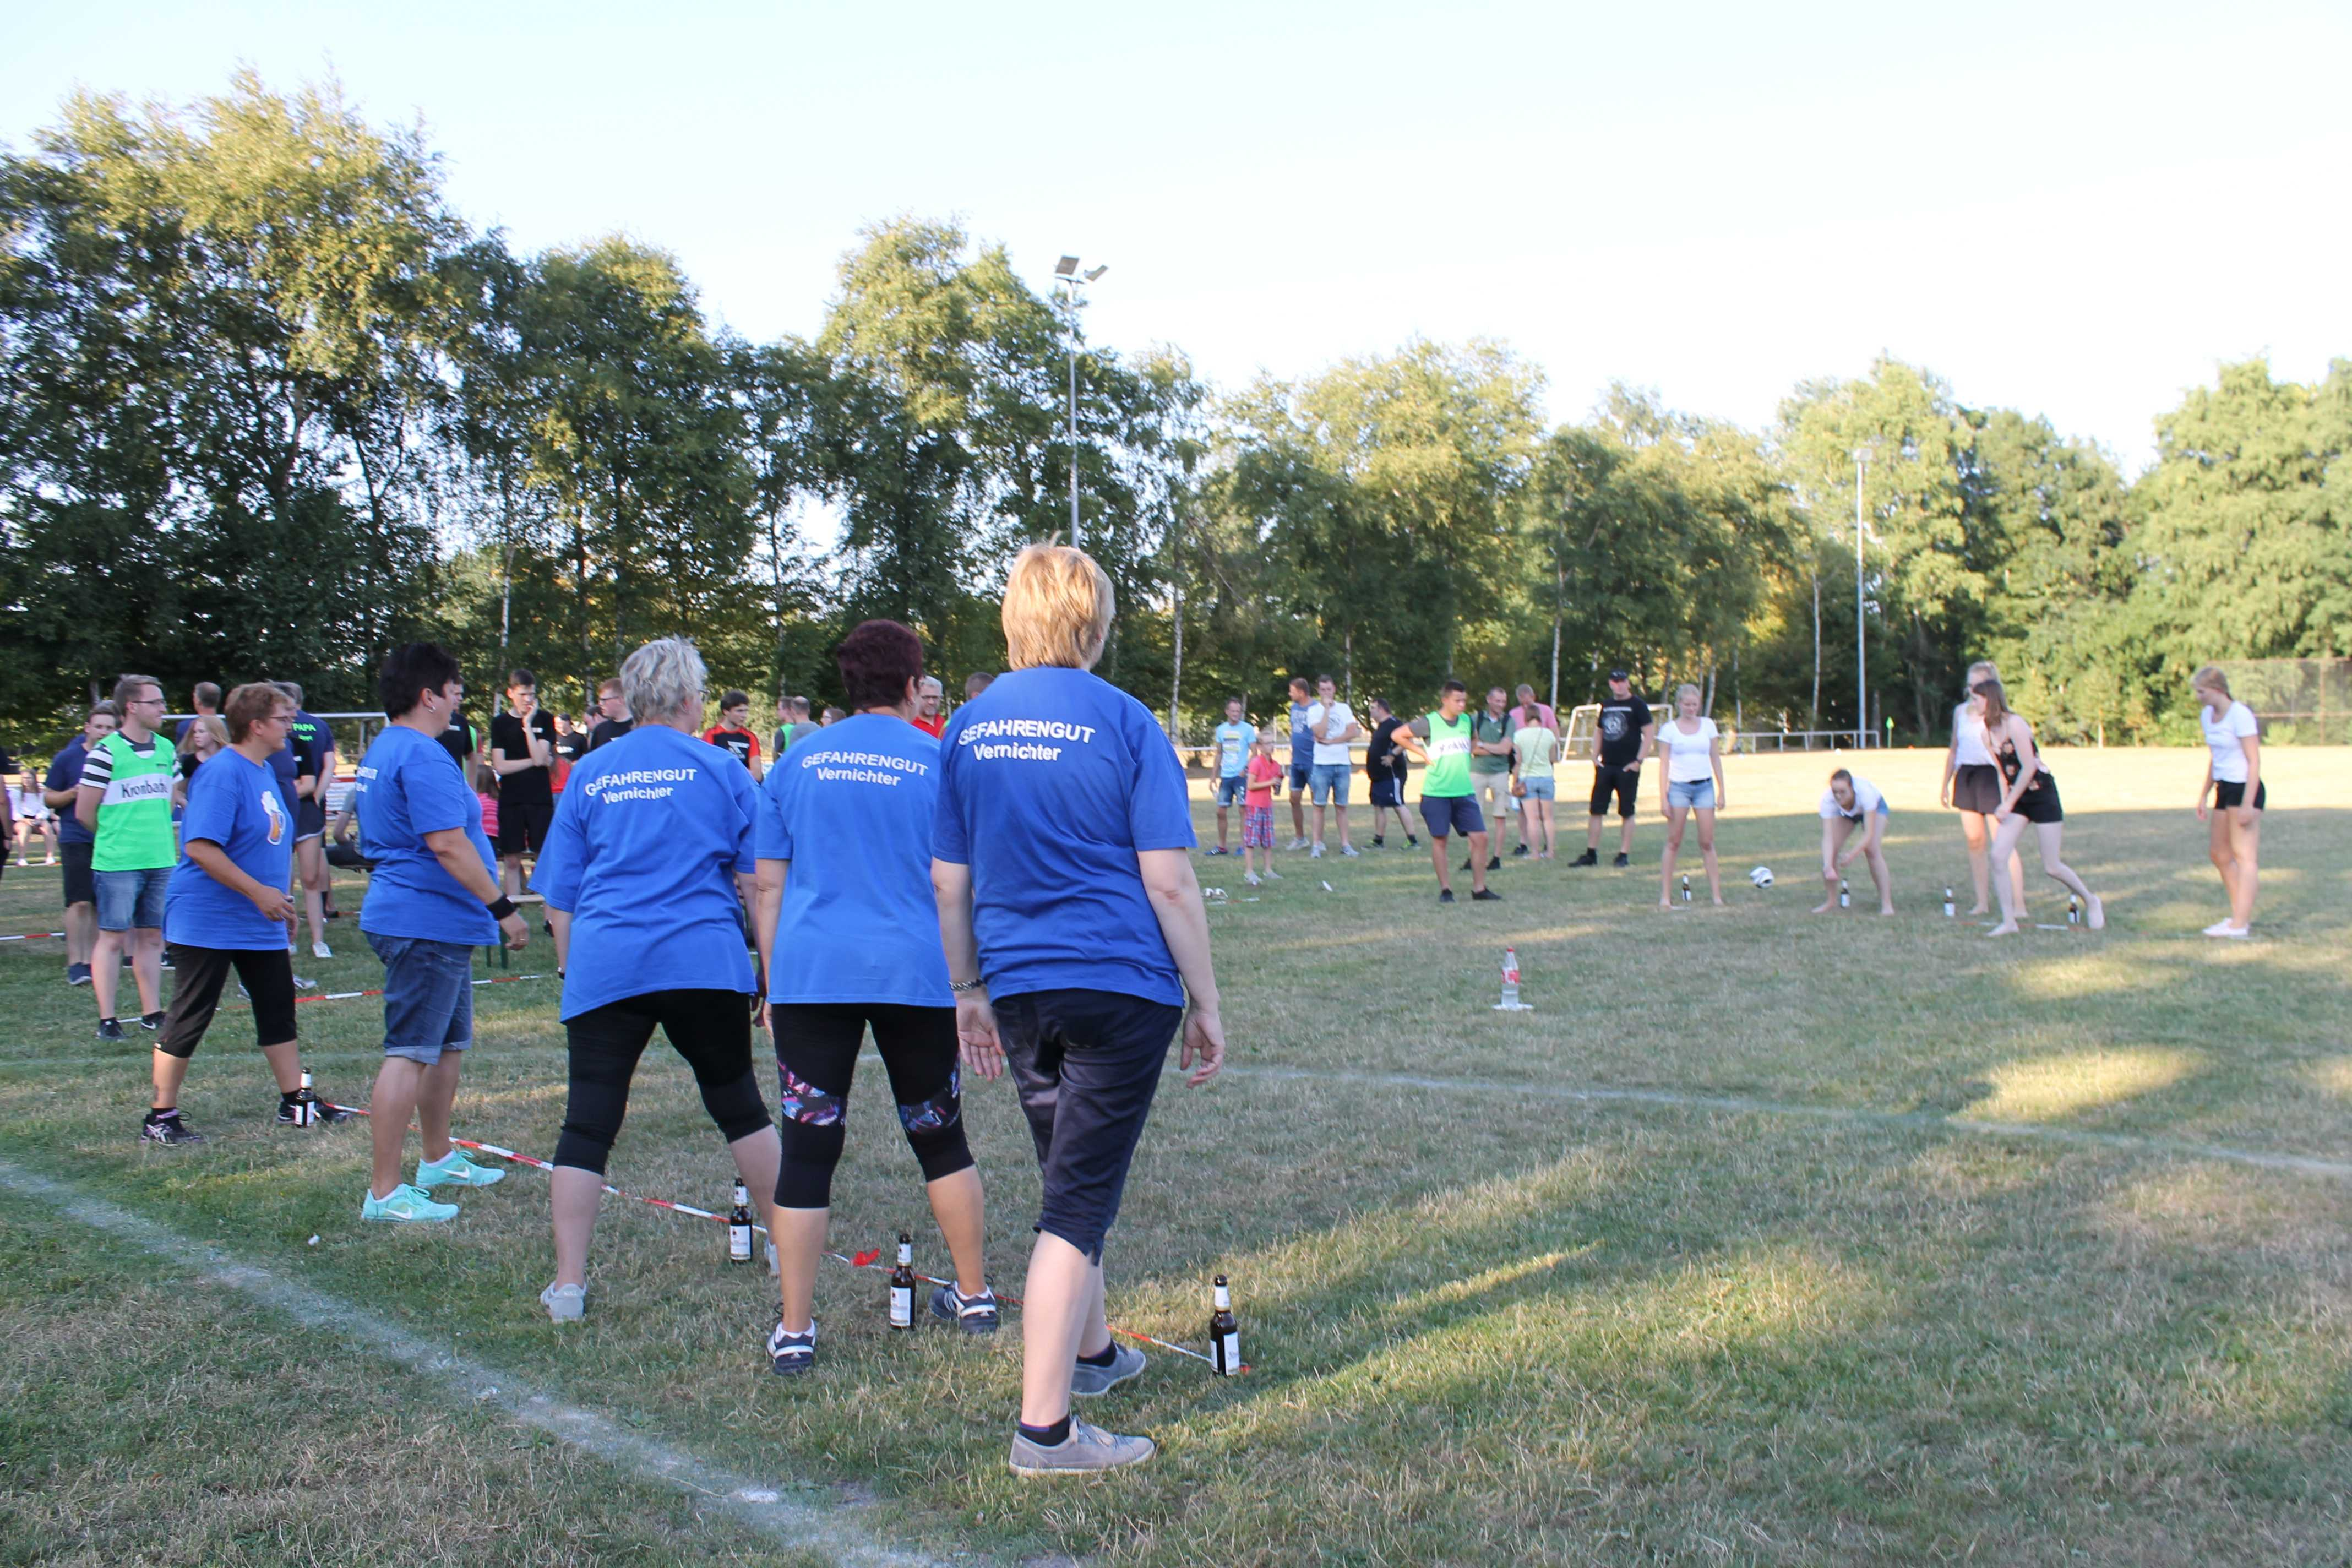 2018-07-27 Sportwoche - Flunkyball Turnier (19)